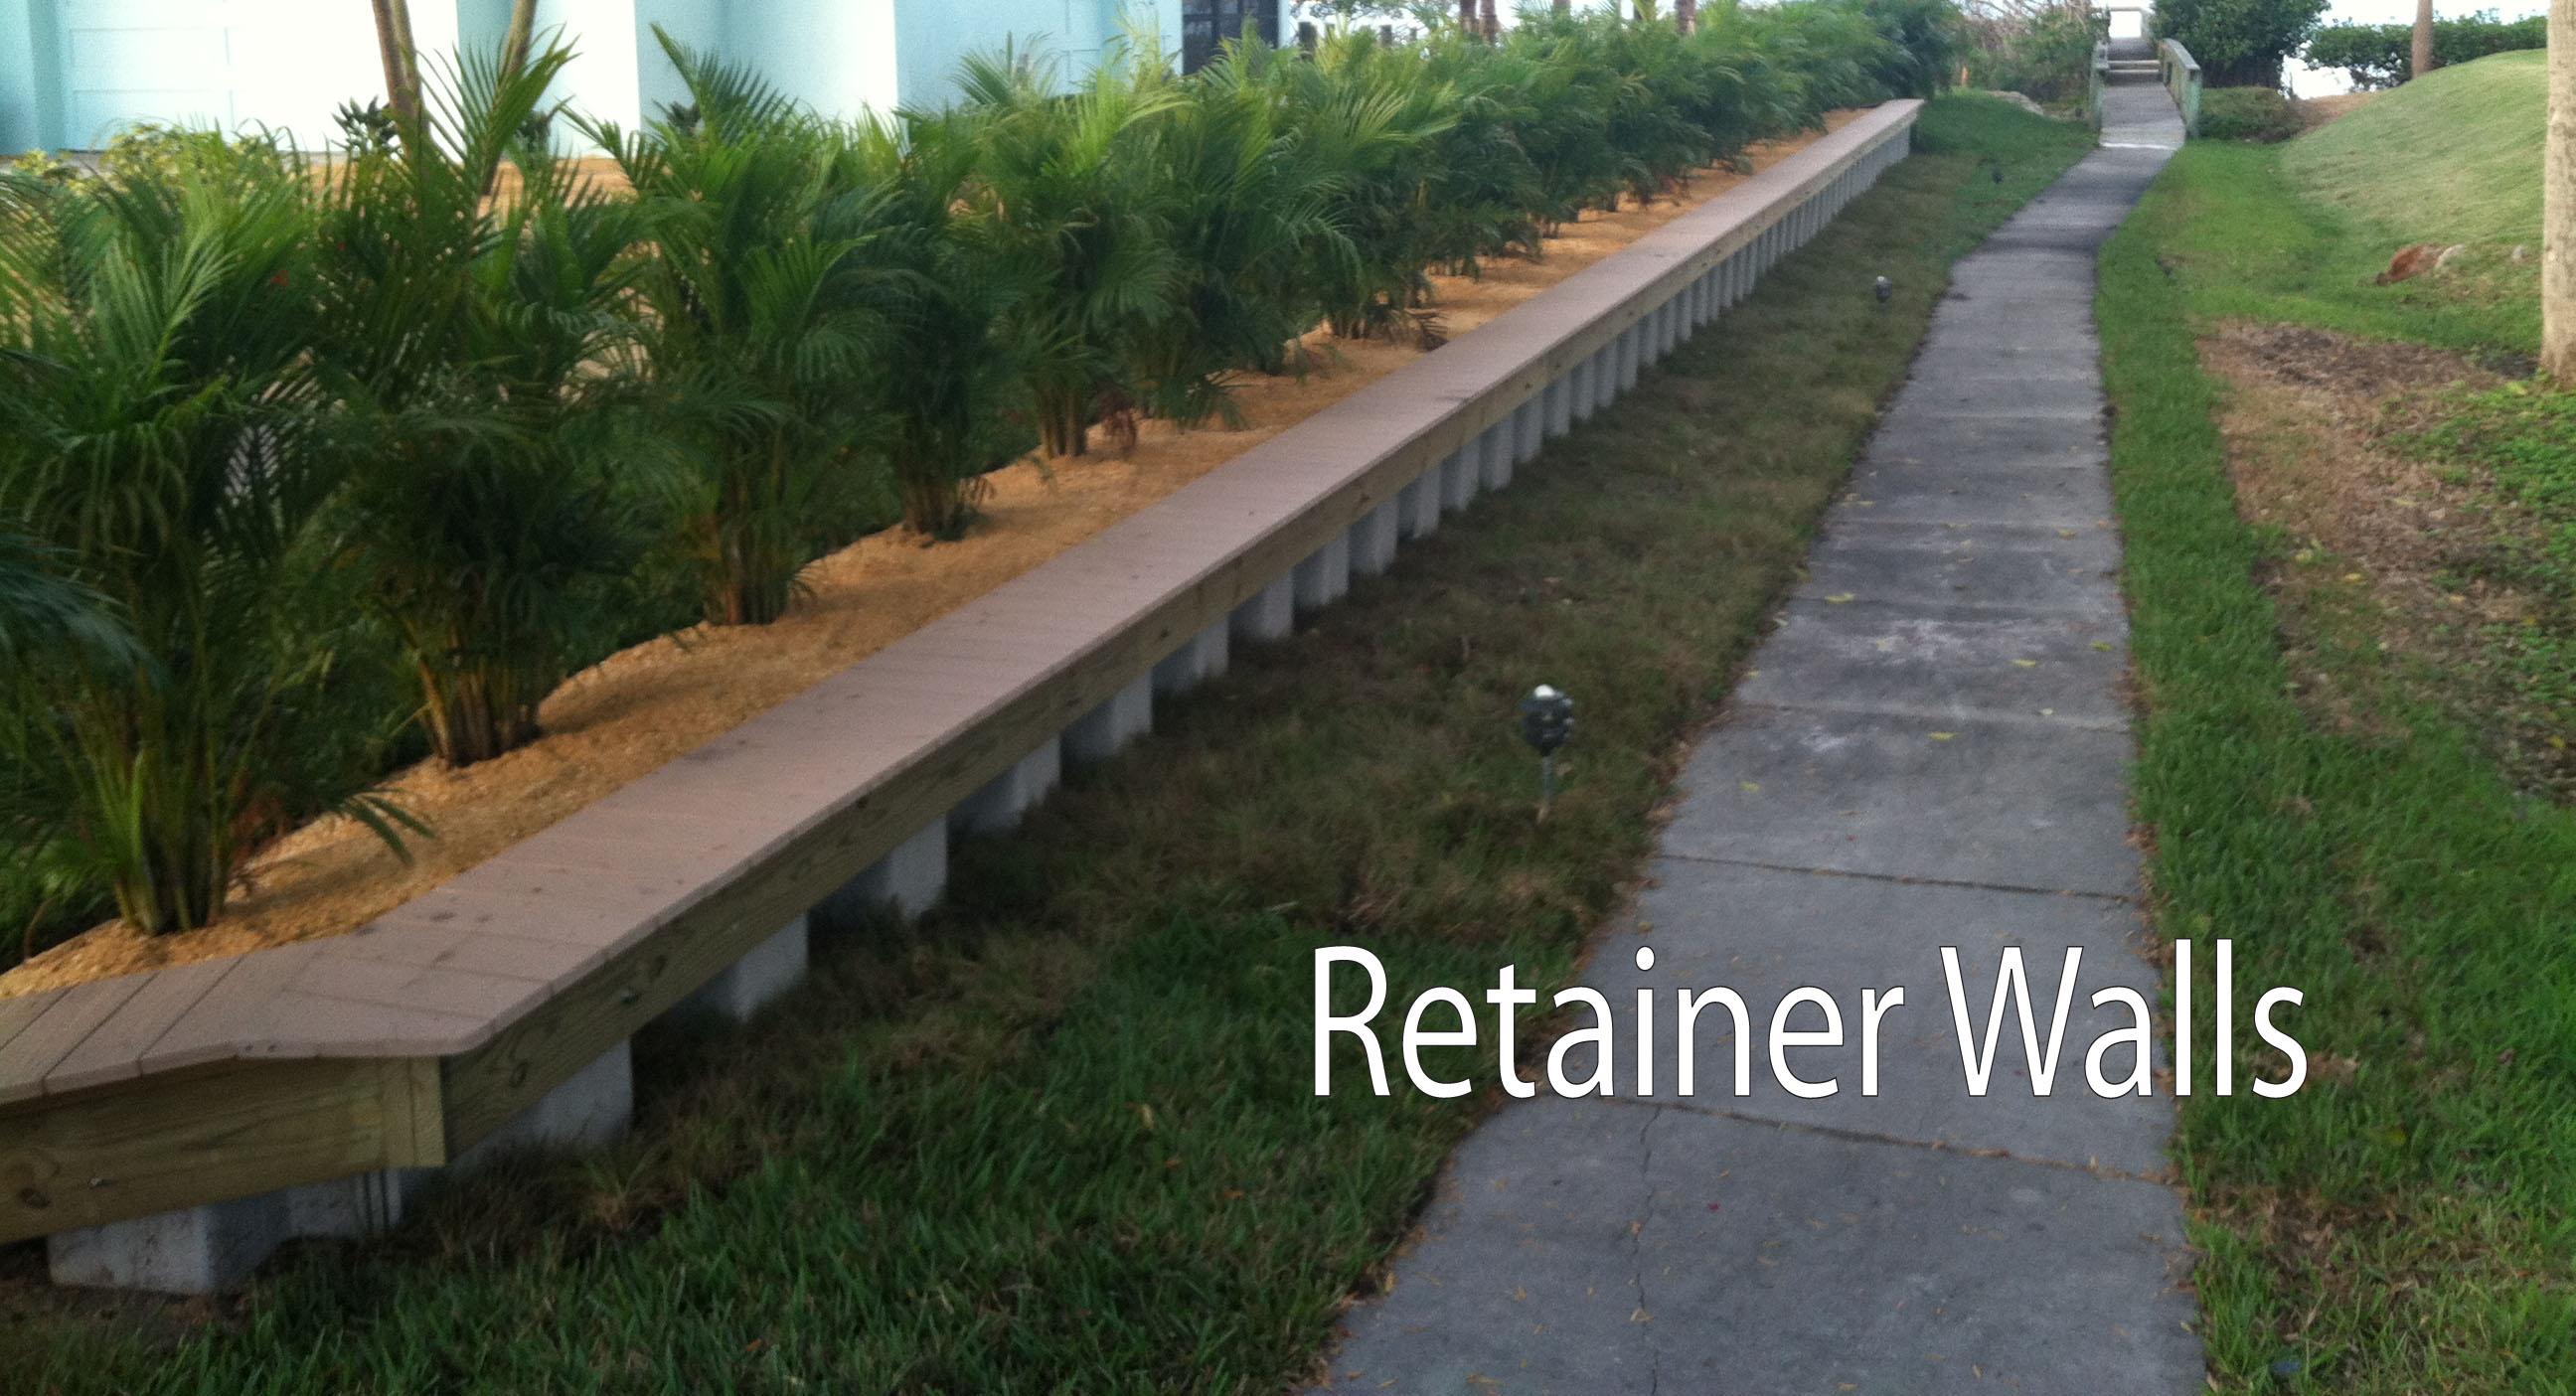 Retainer Walls